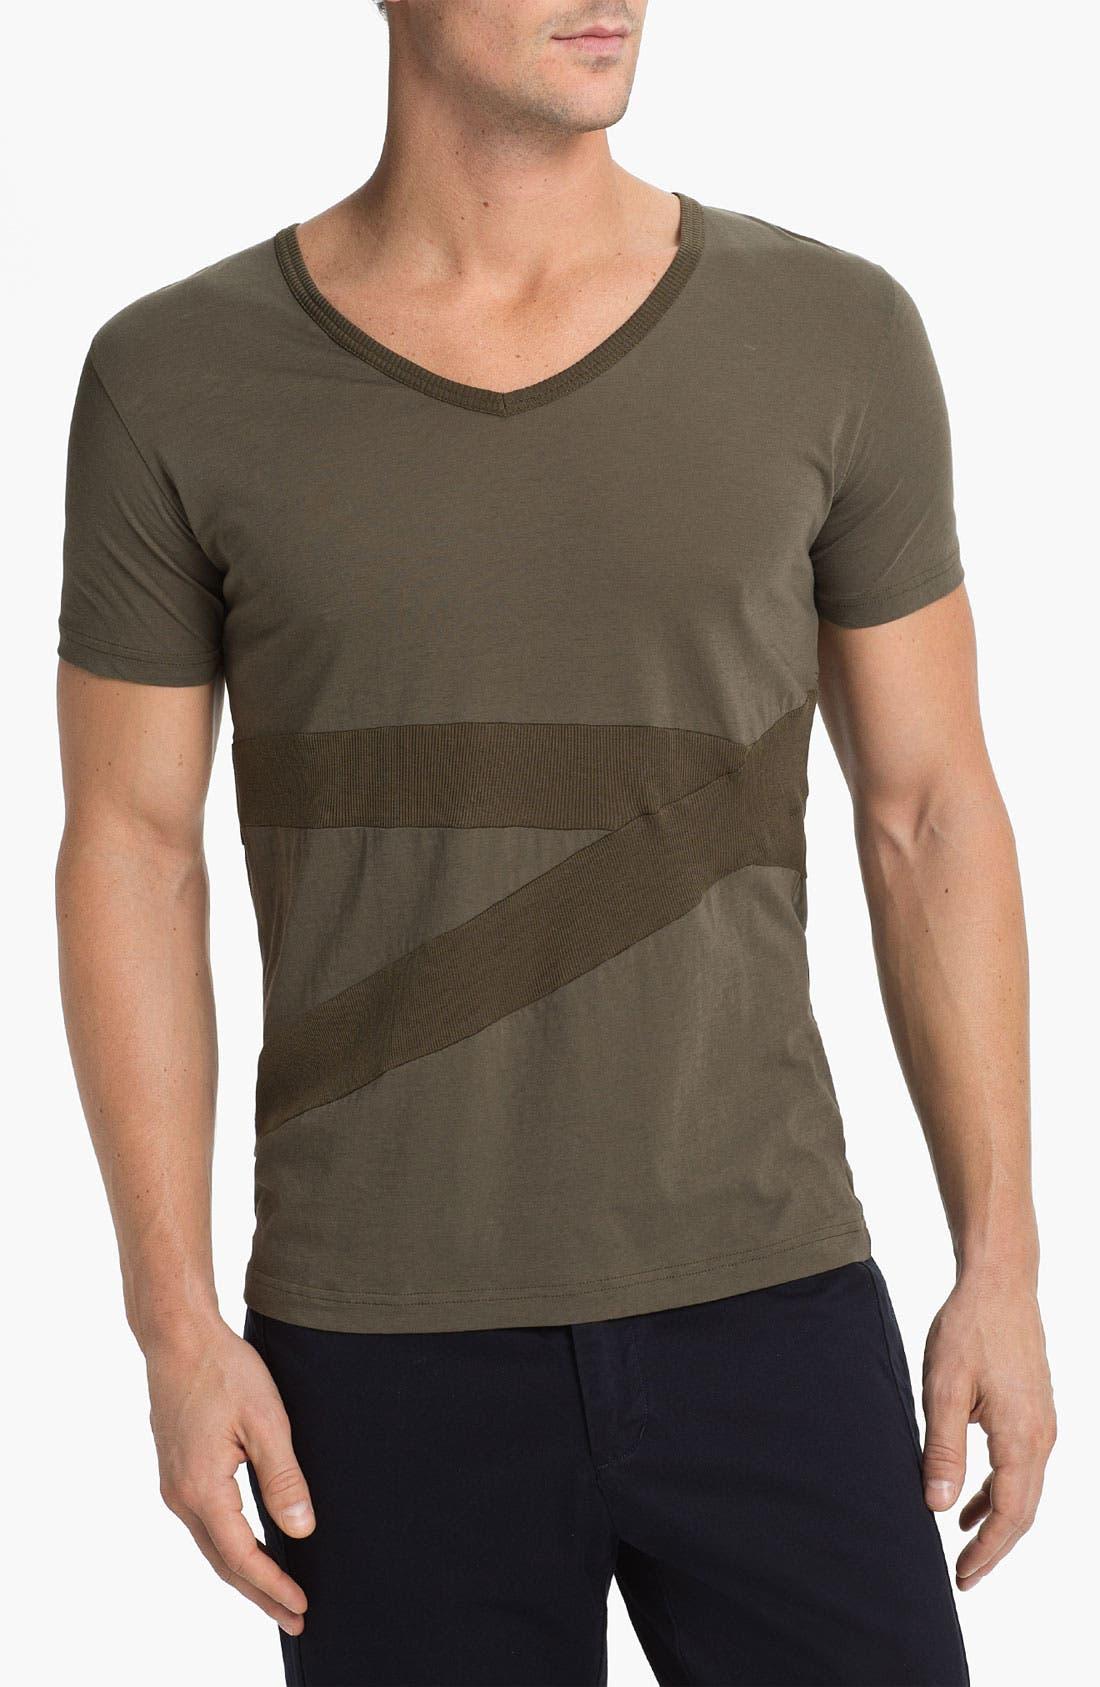 Alternate Image 1 Selected - adidas SLVR V-Neck T-Shirt